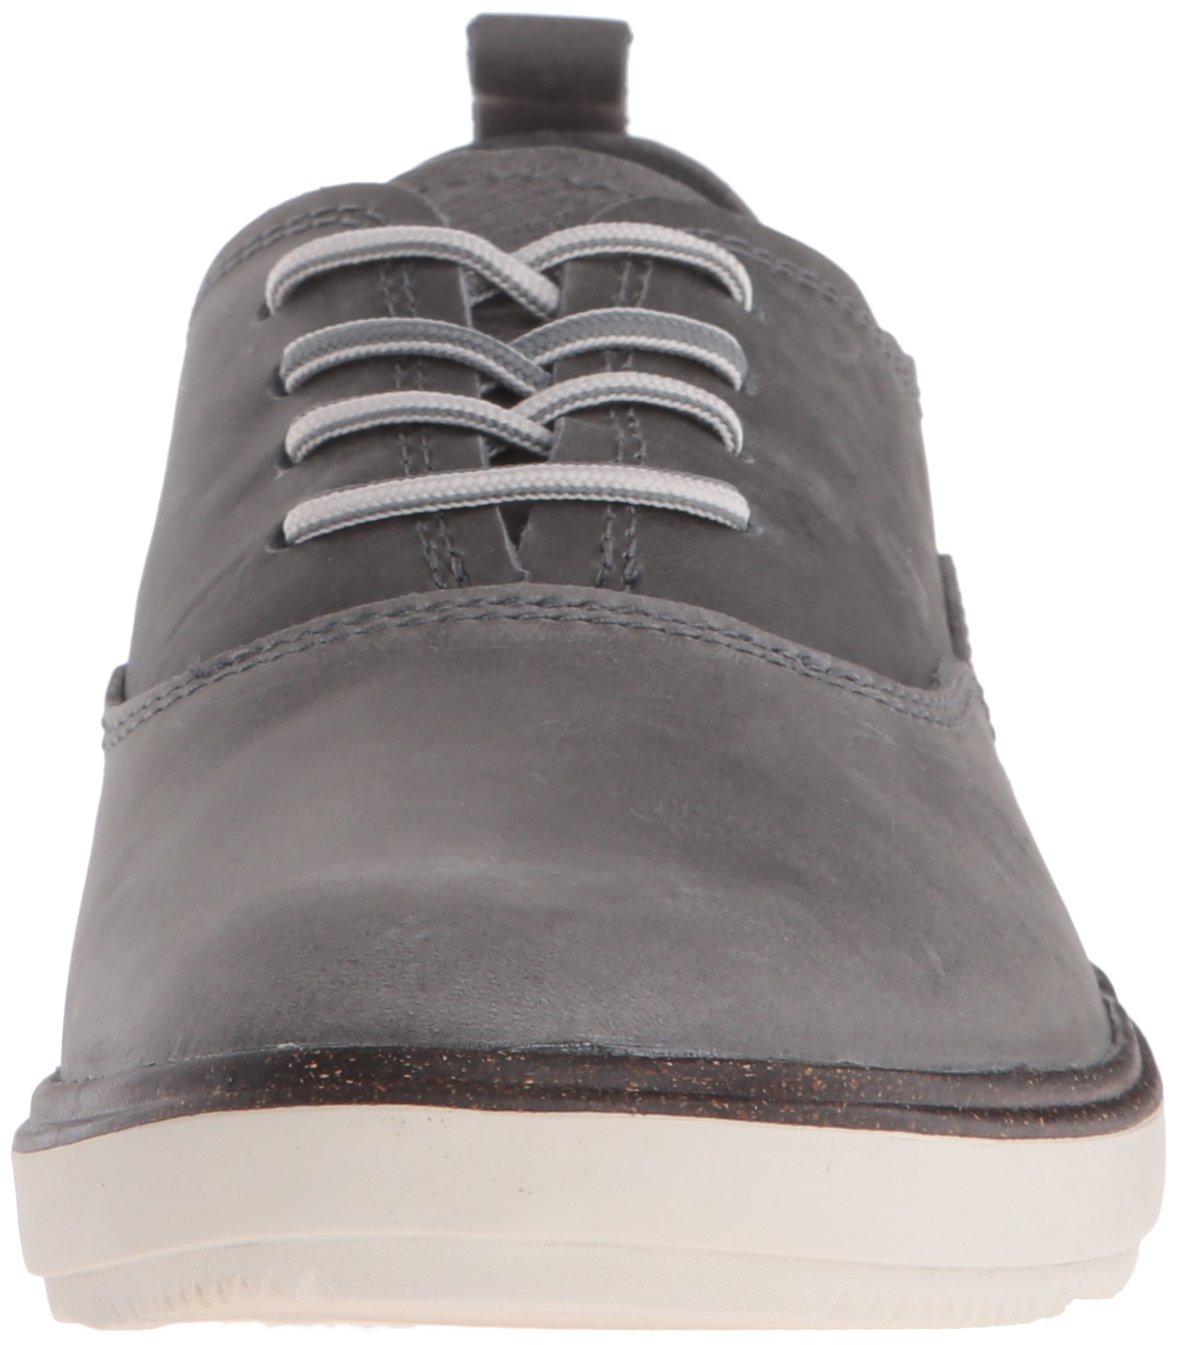 Merrell Women's Around Town Lace Fashion Sneaker B0195EPDQM 6 B(M) US|Sedona Sage